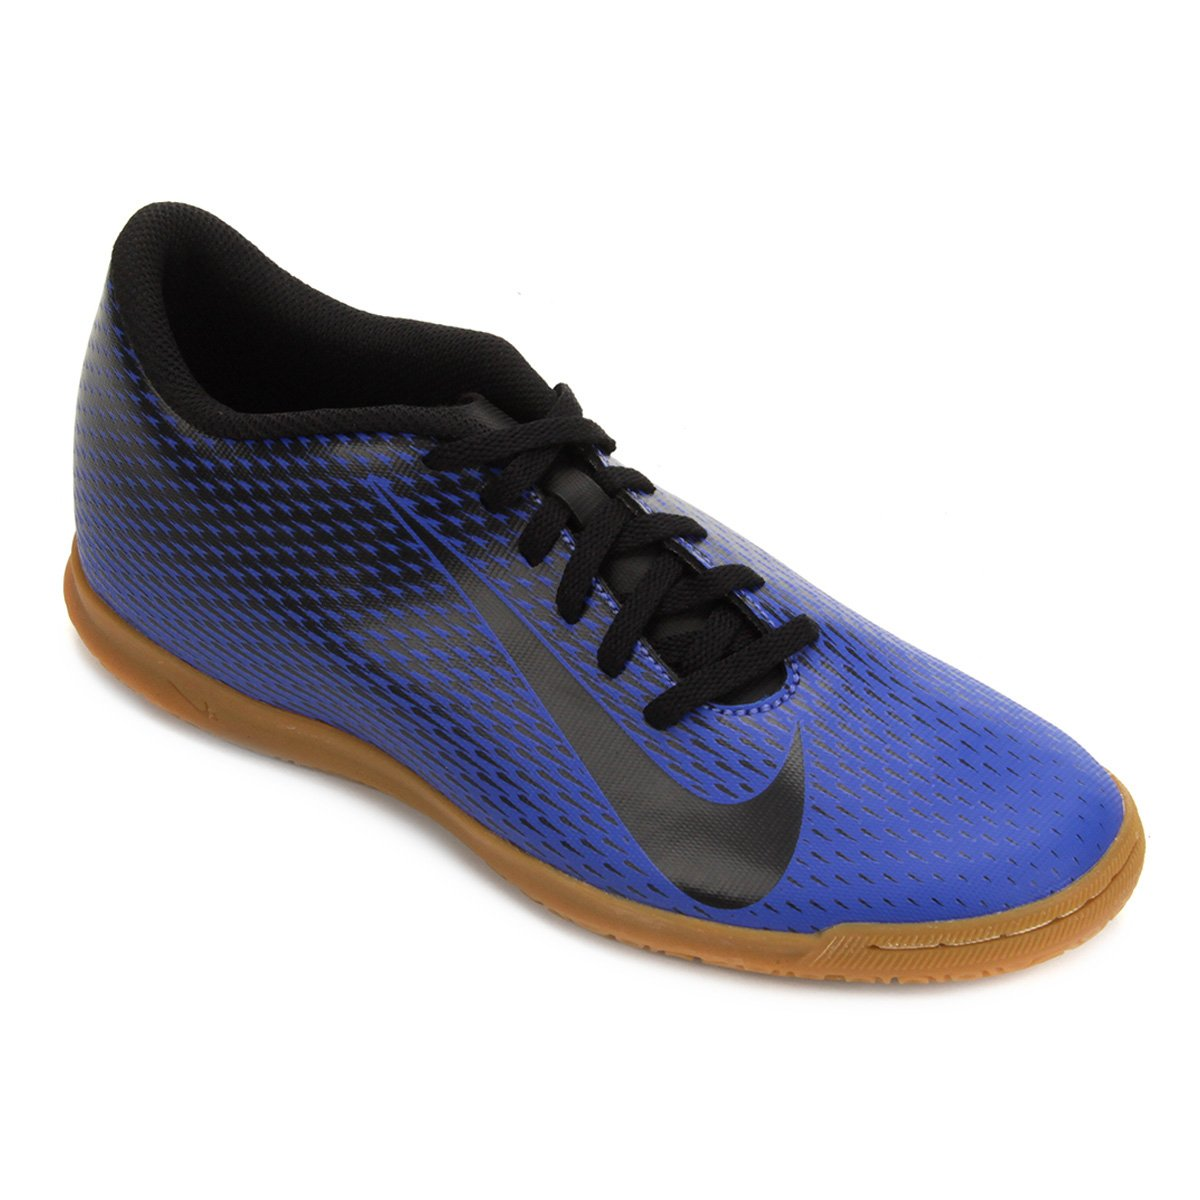 f11307907219e Chuteira Futsal Nike Bravata 2 IC - Azul e Preto | Shop Timão